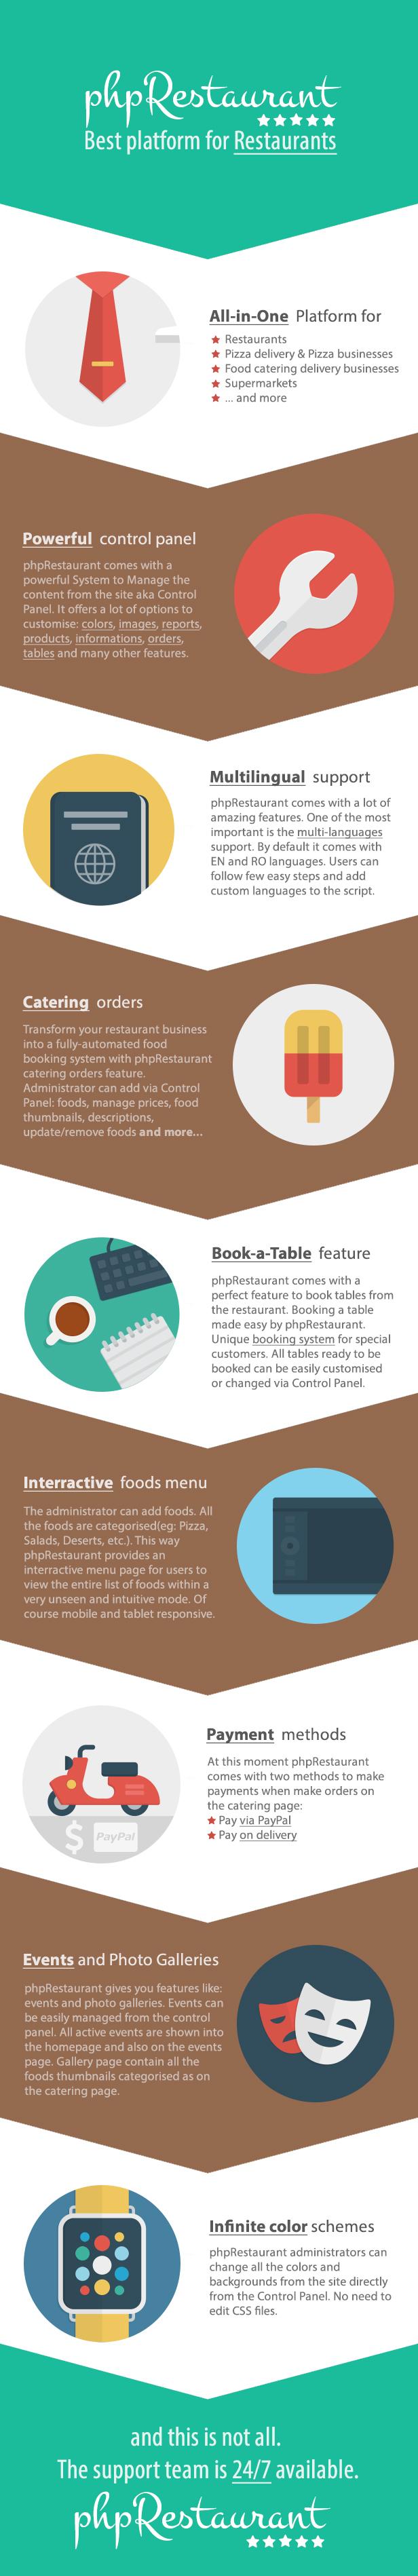 phpRestaurant - Restaurant Script with CMS - 3